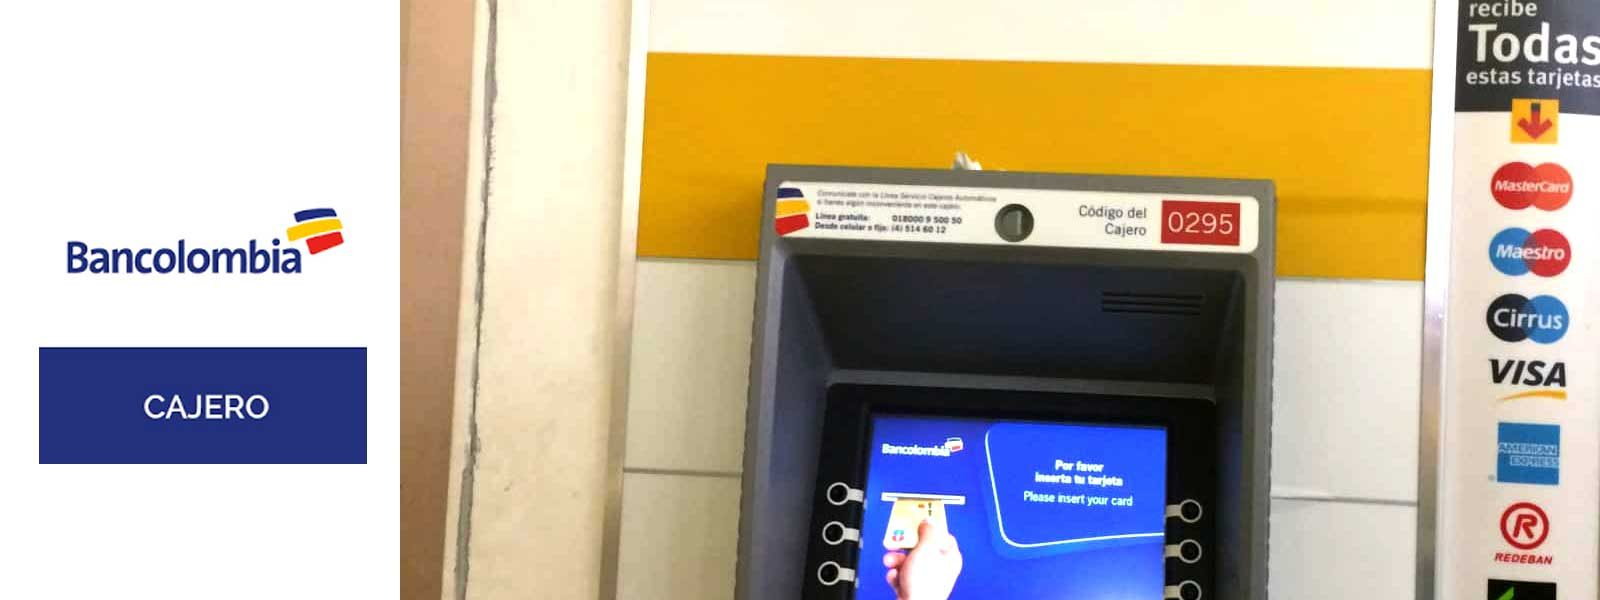 Cajero ATM Bancolombia